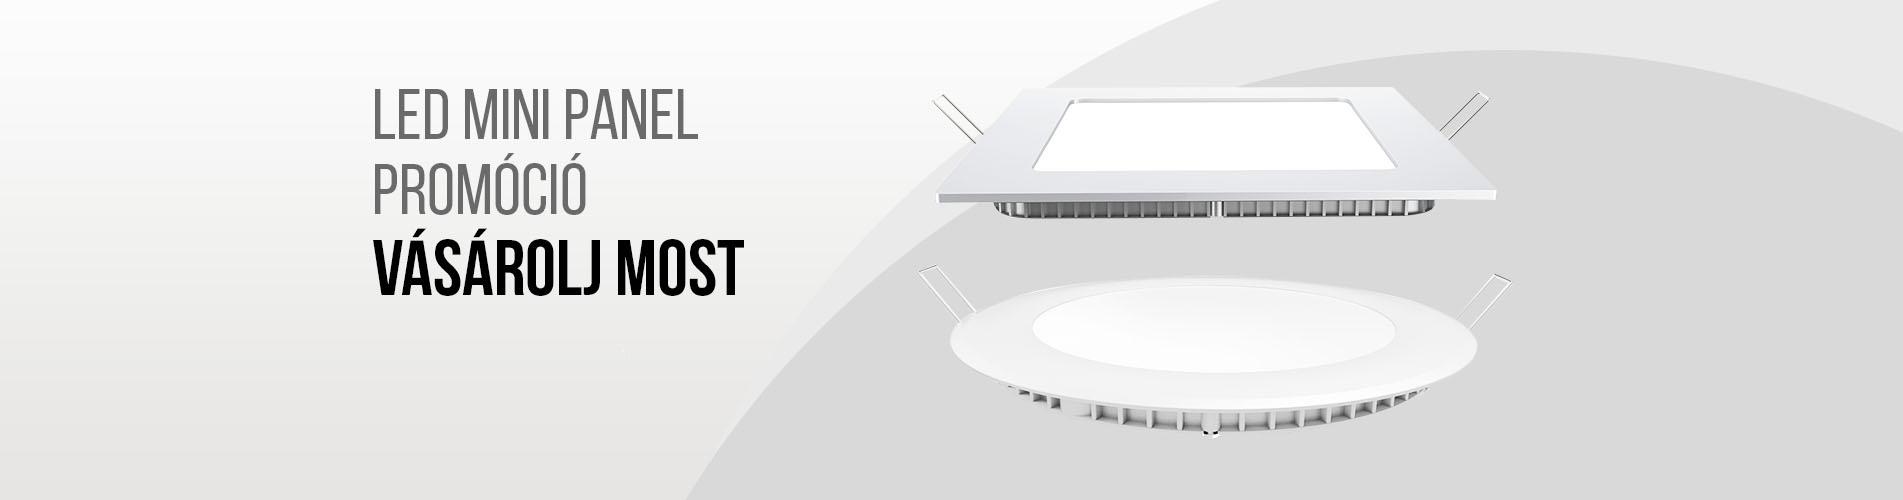 Akciós LED panelek